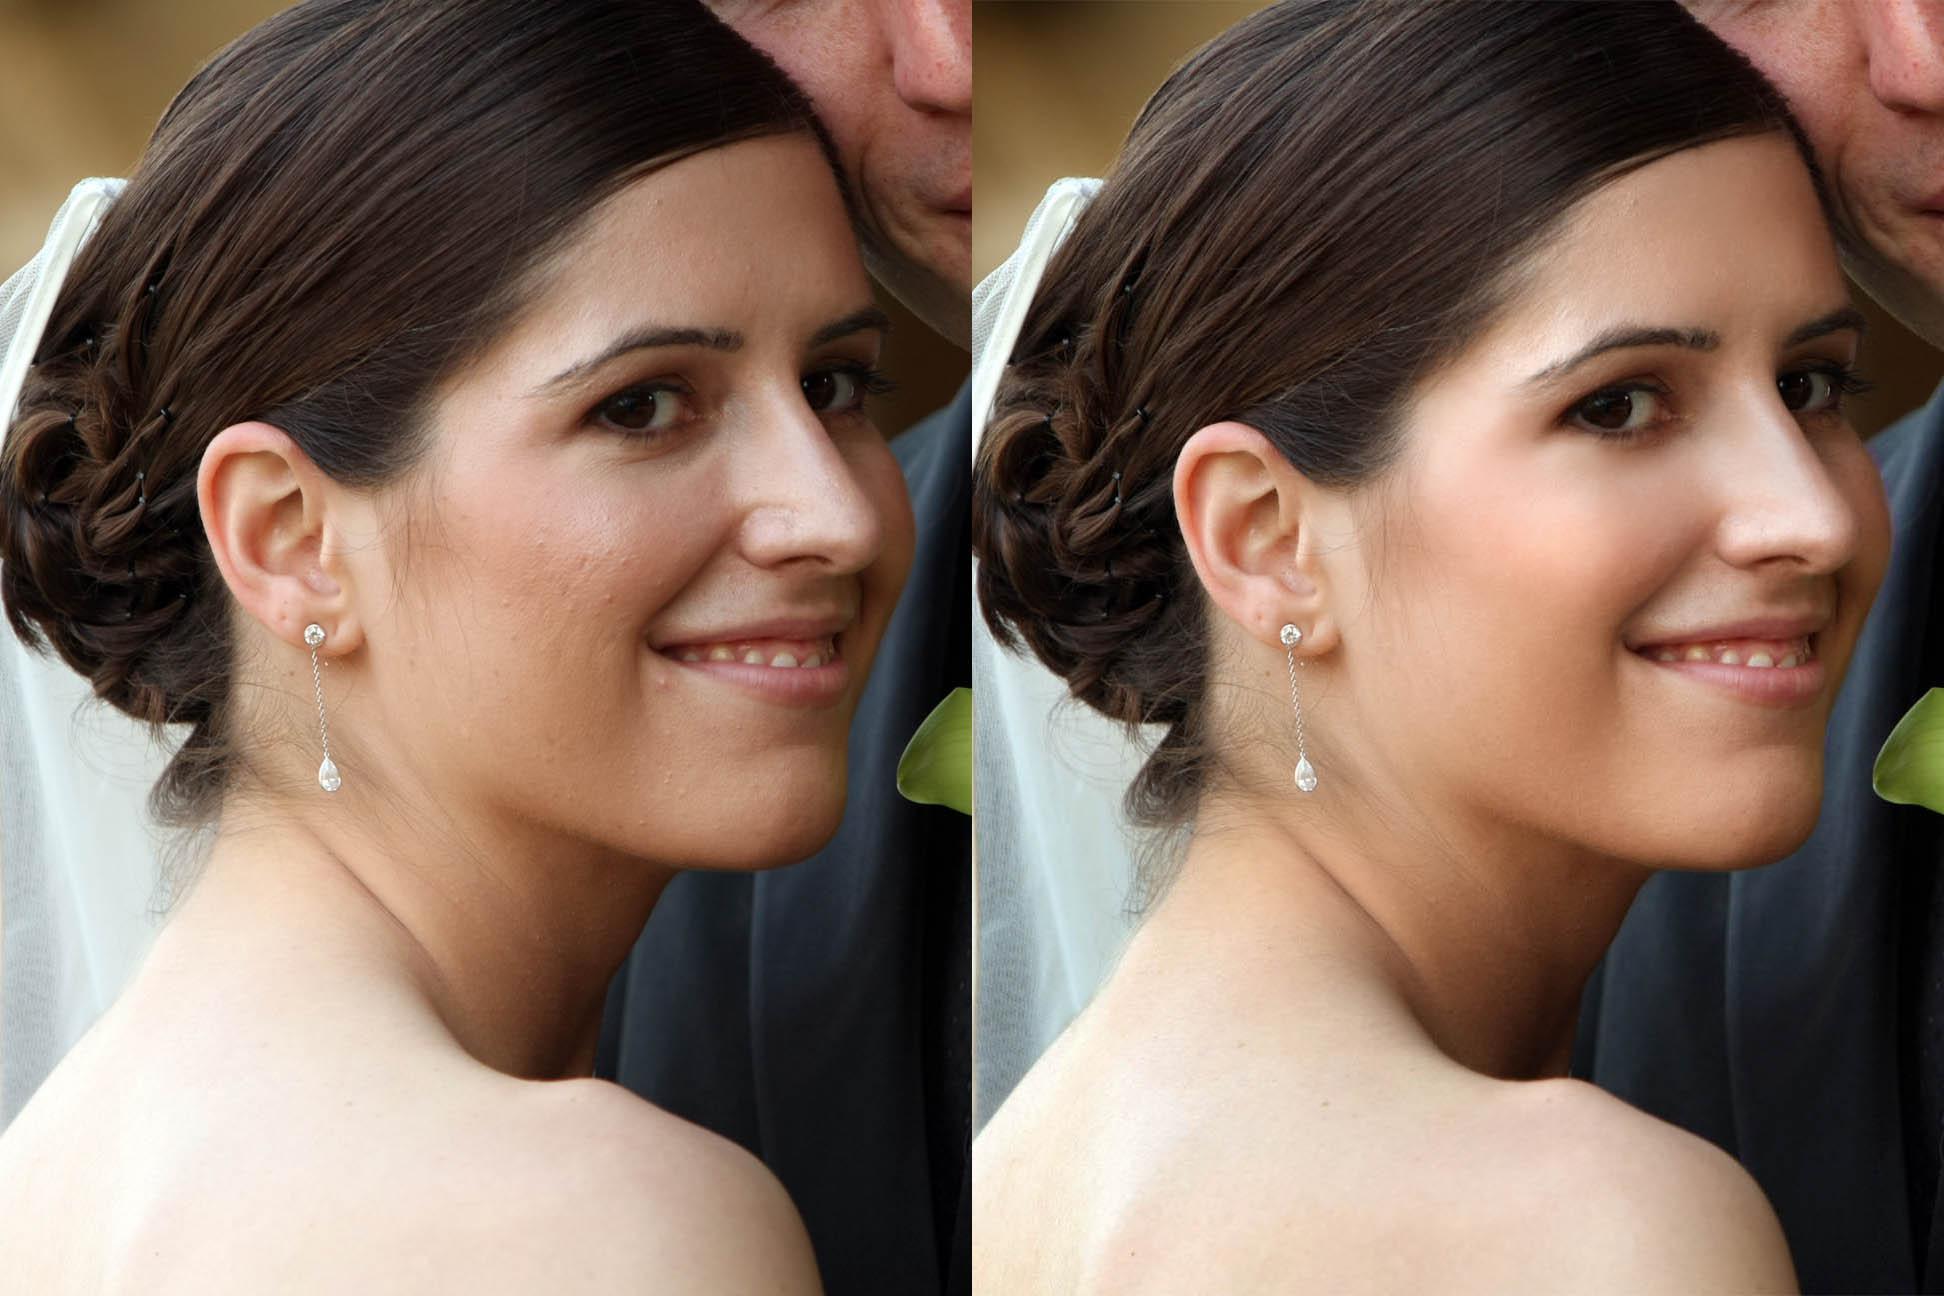 wedding photo of a bride facial retouching